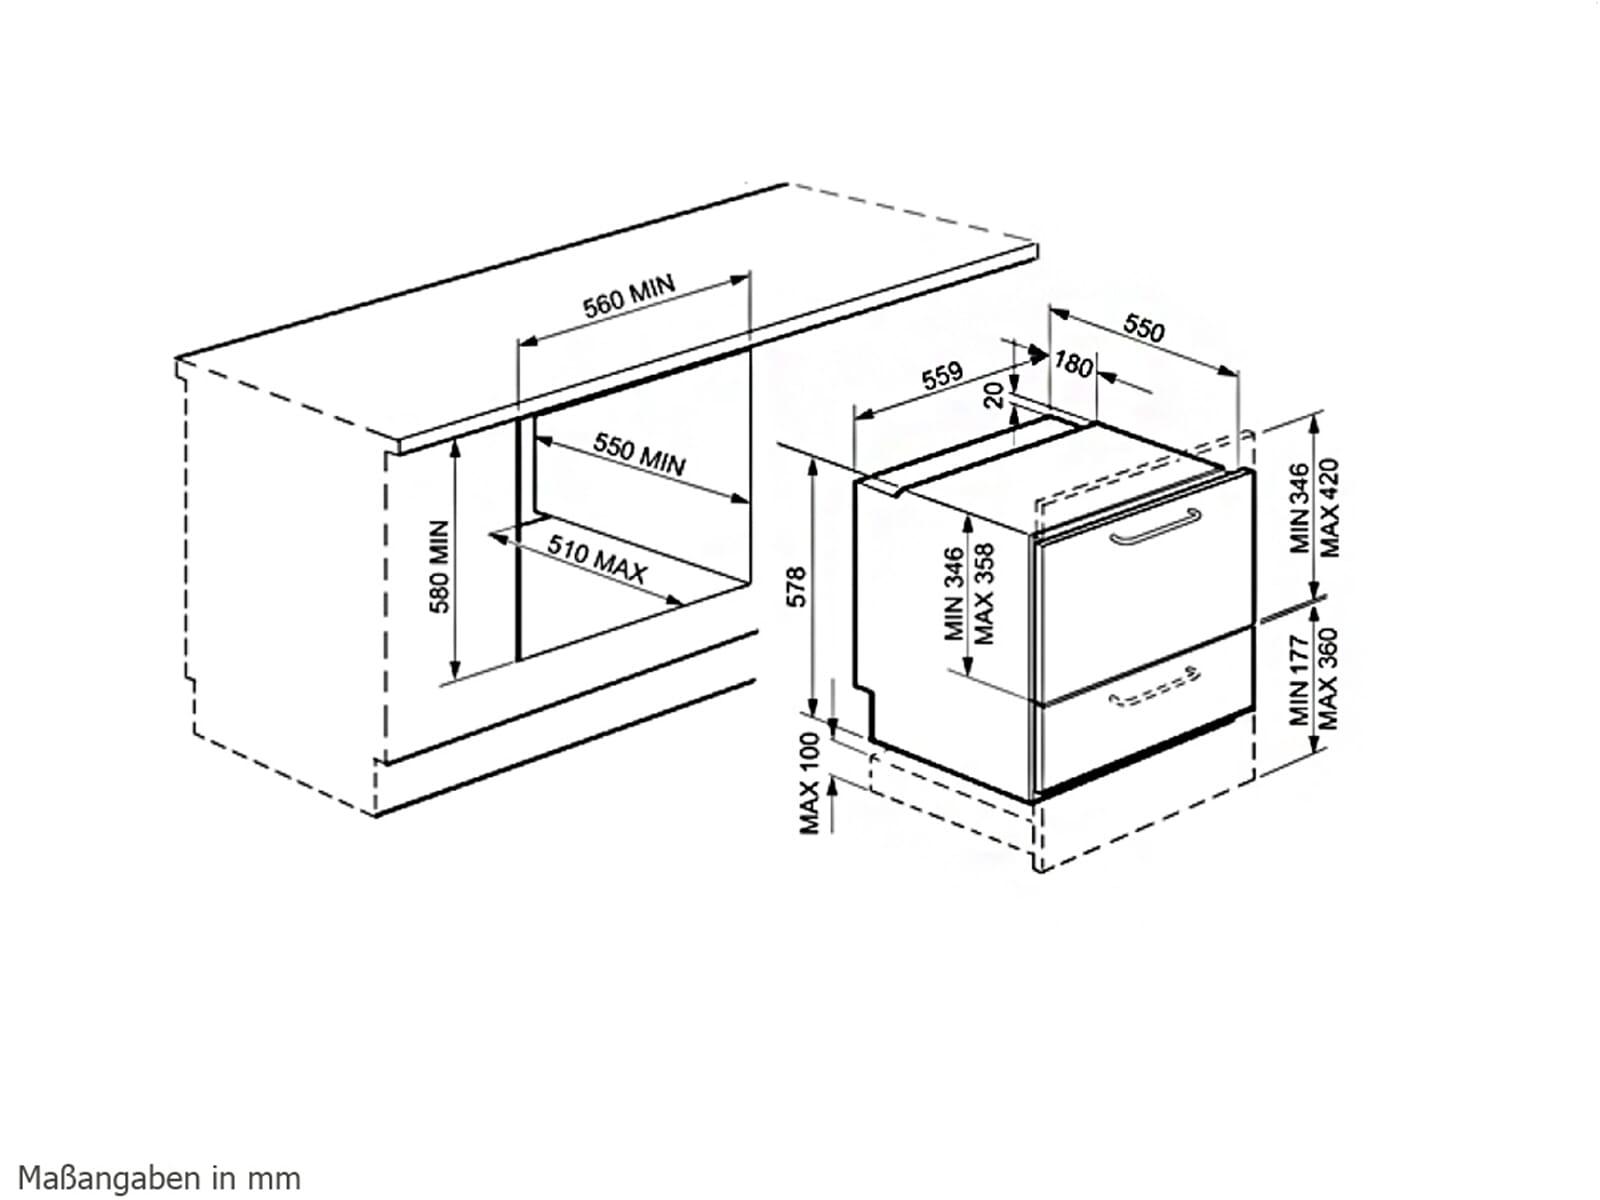 Smeg STC75 Vollintegrierbarer Einbaugeschirrspüler